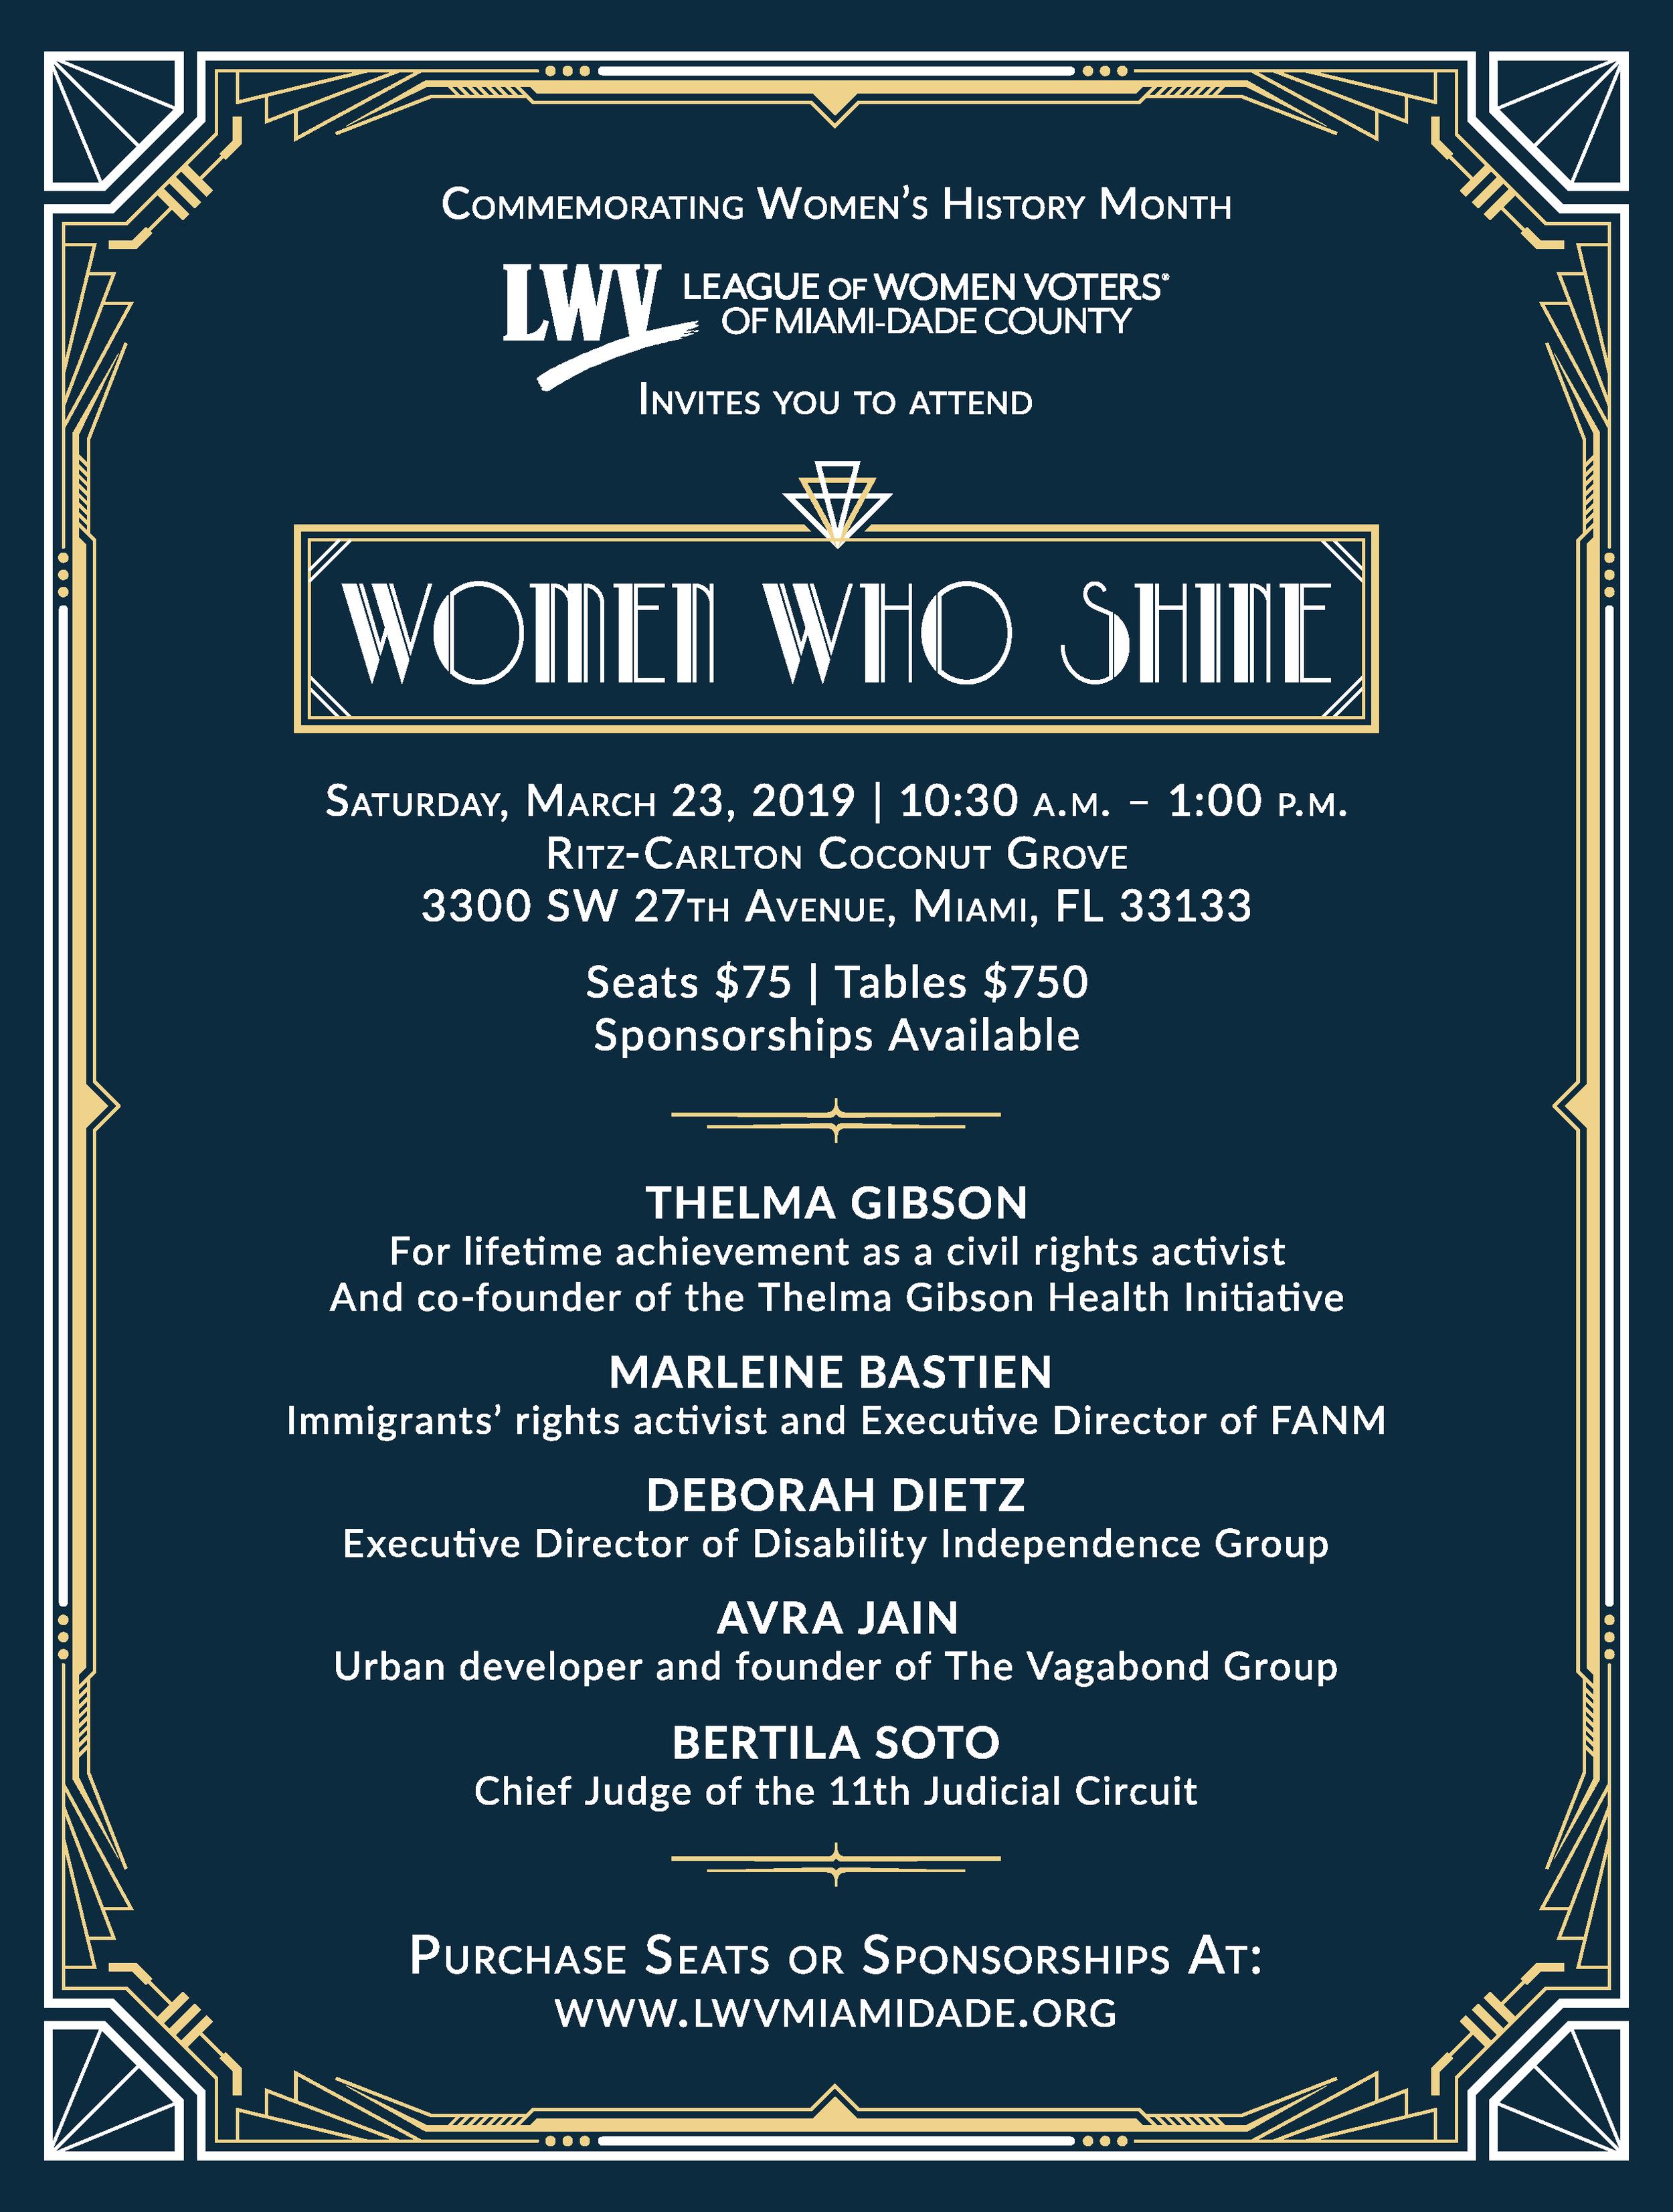 Women Who Shine 2019 Invitation Final.png